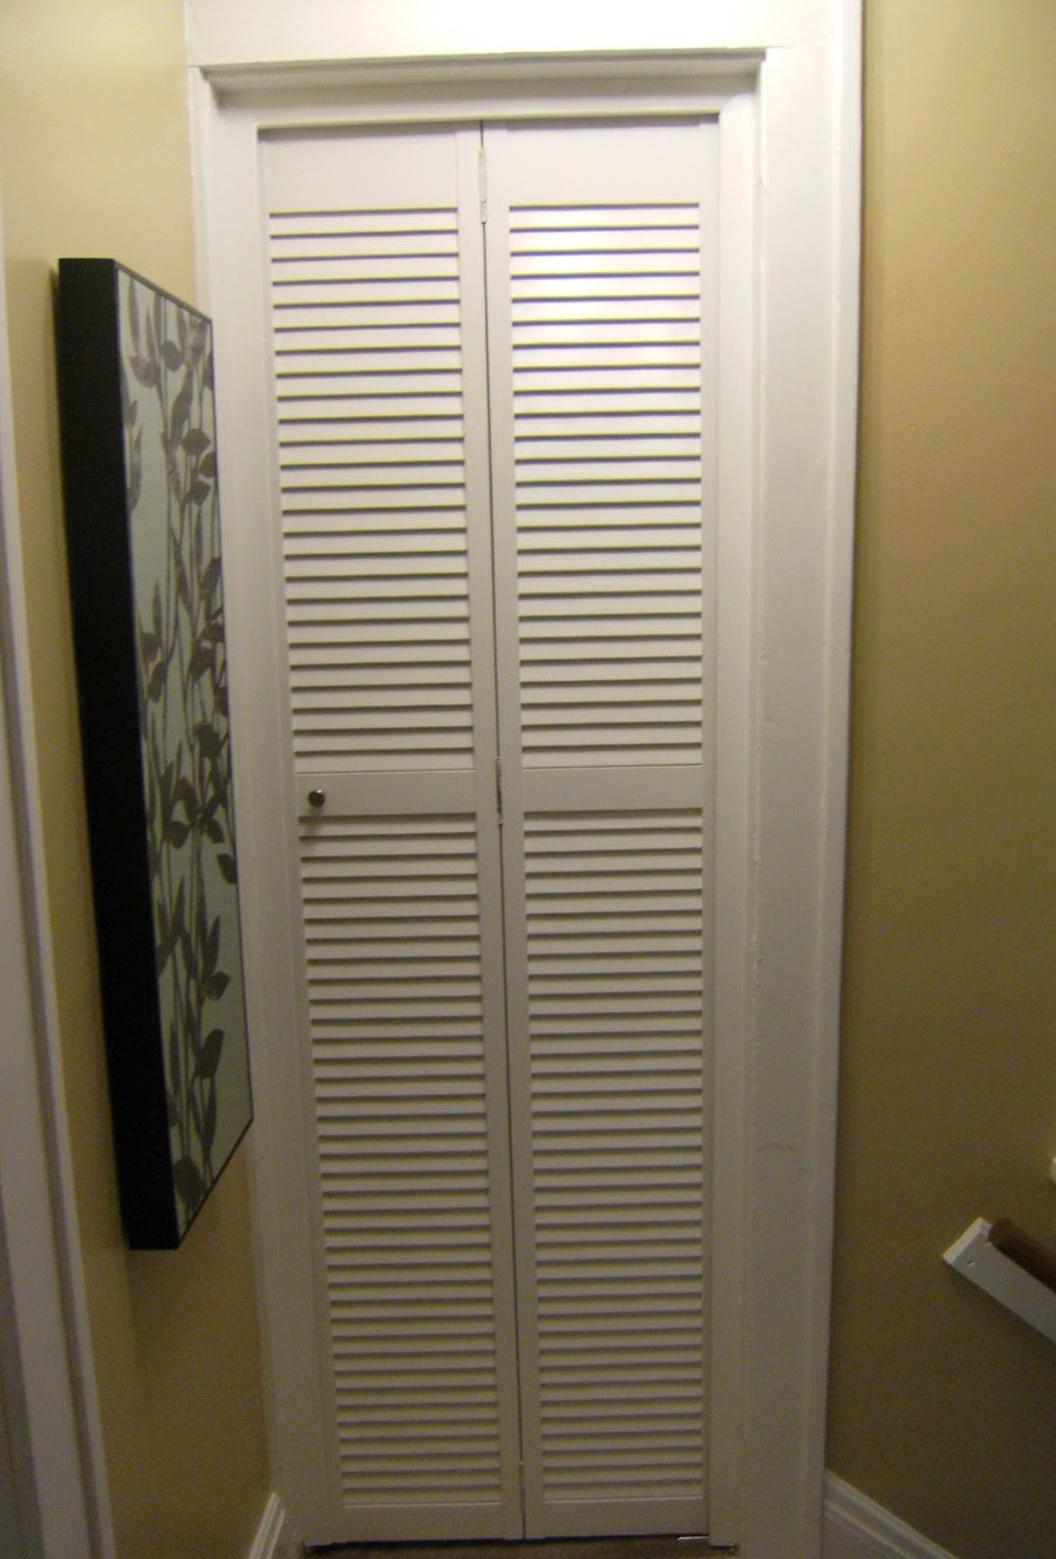 Bifold Closet Door Sizes | Home Design Ideas